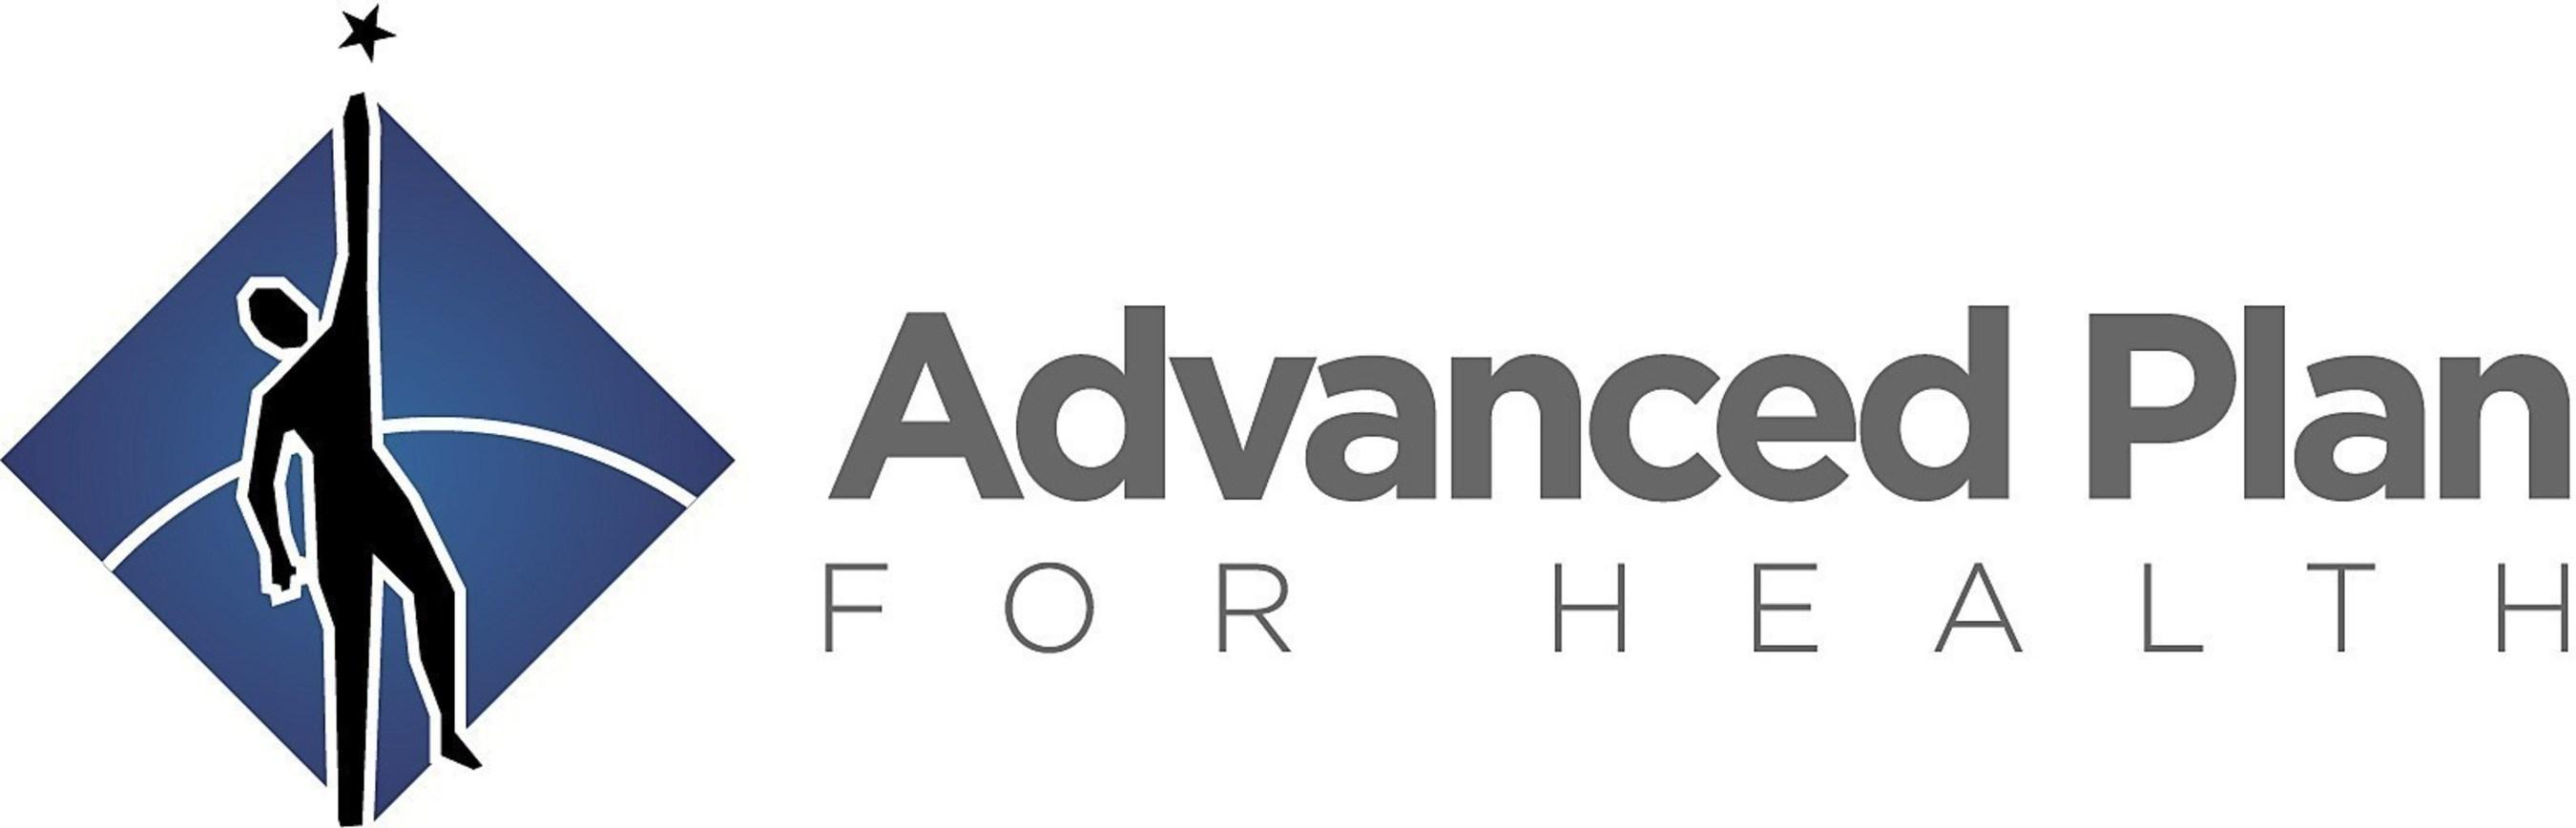 Advanced Plan for Health